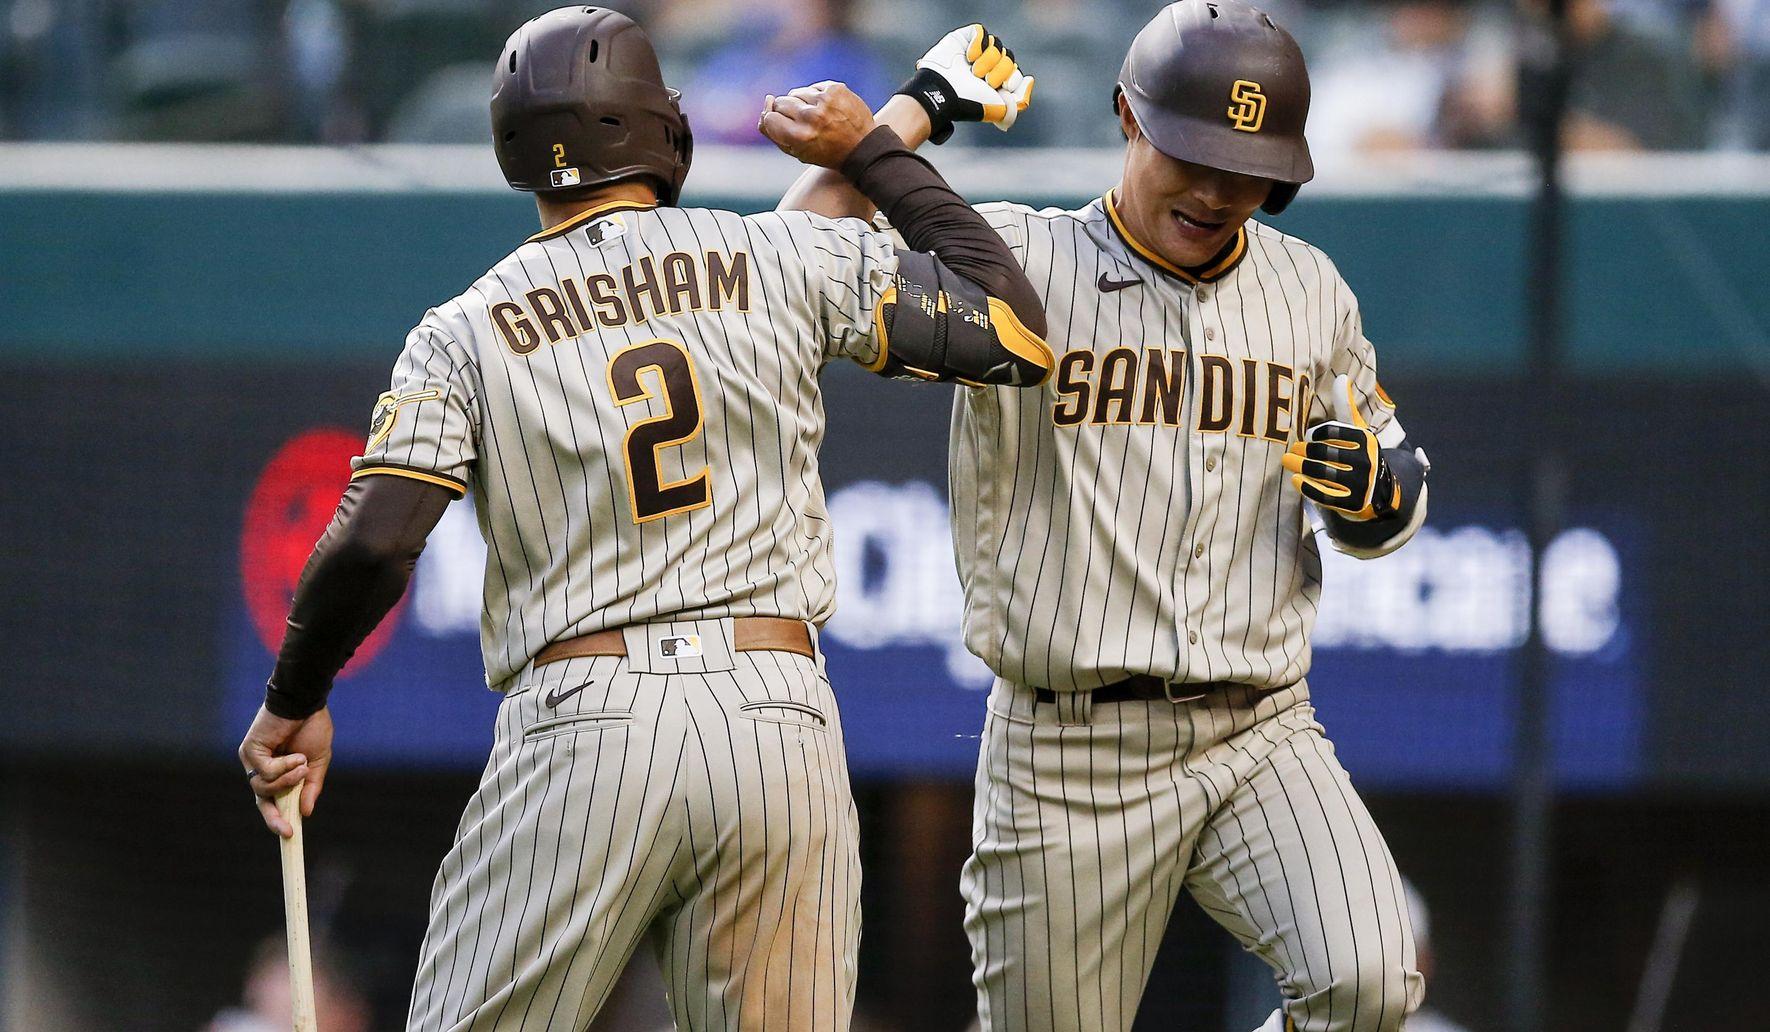 Padres_rangers_baseball_78821_c0-133-3369-2097_s1770x1032